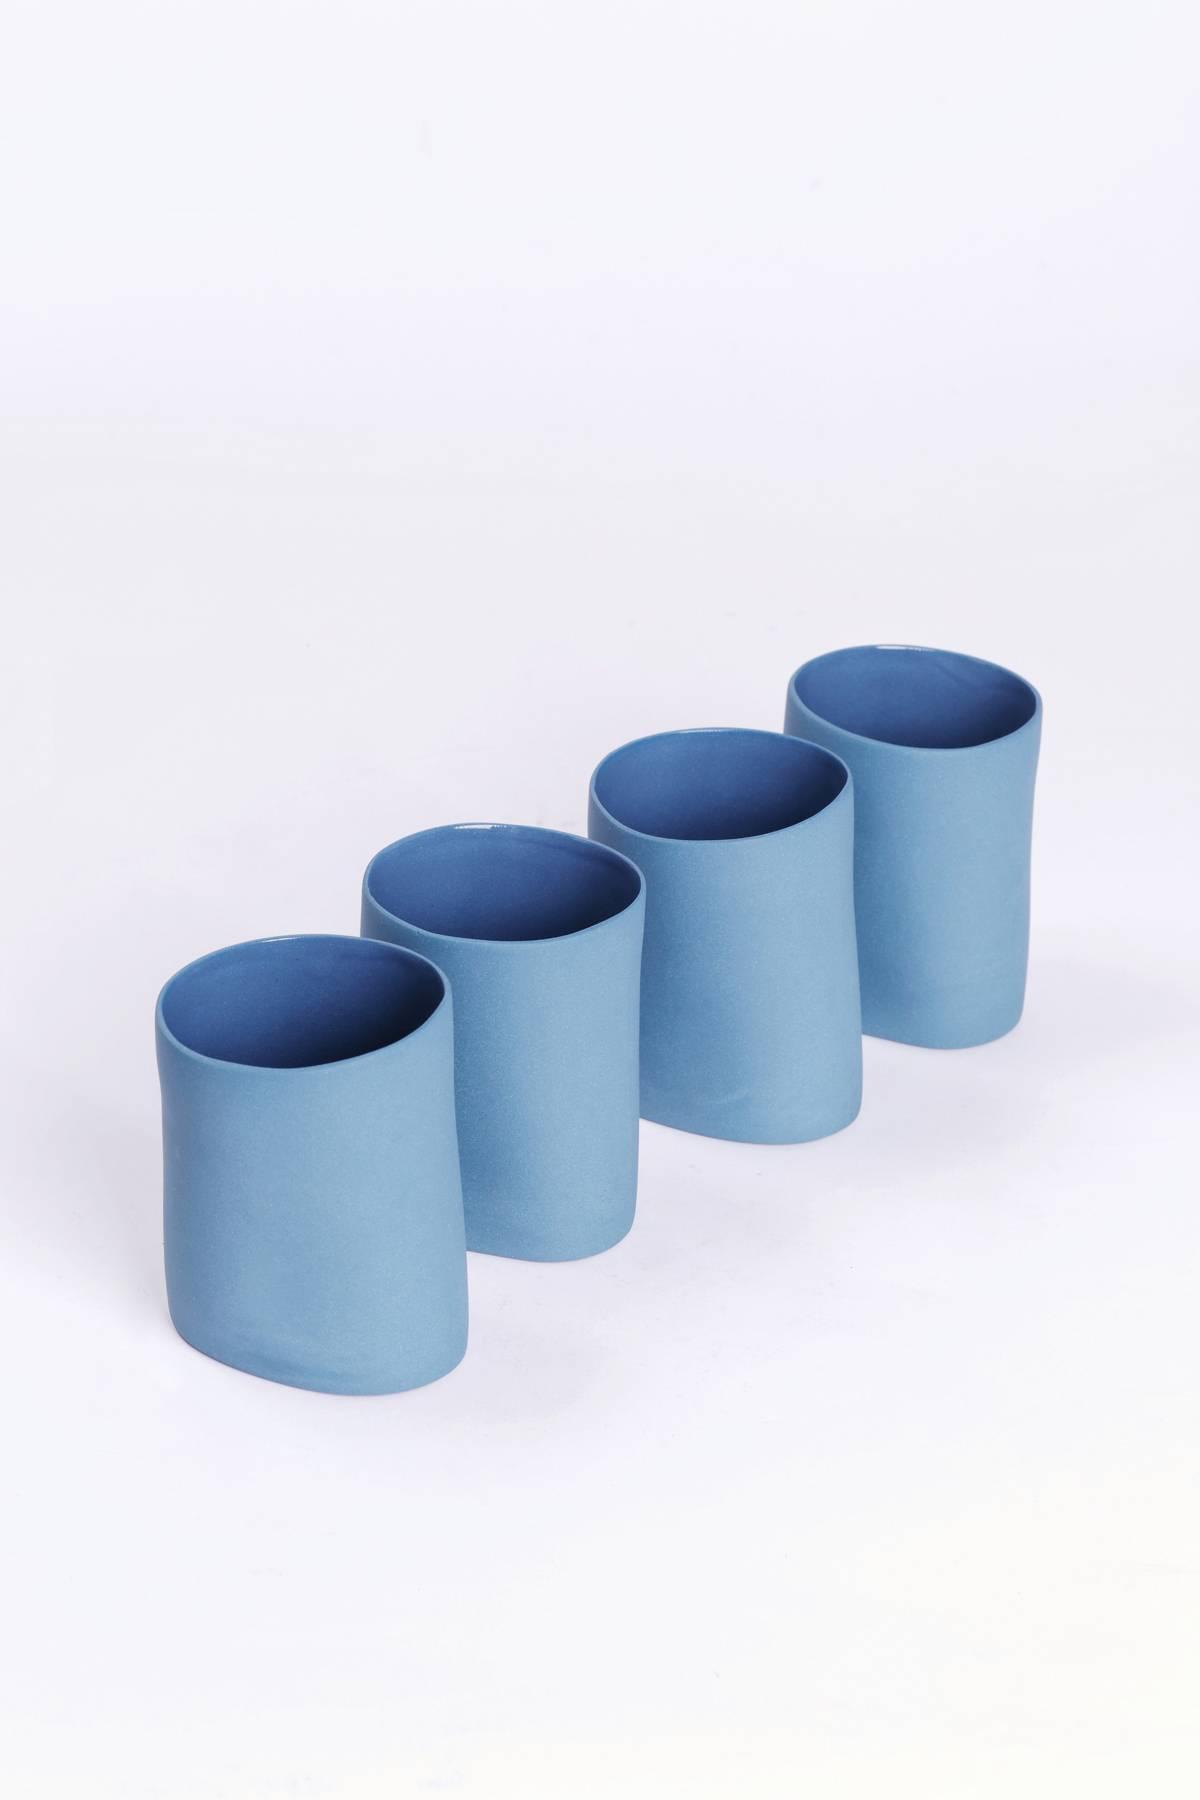 Copos assimétricos de porcelana